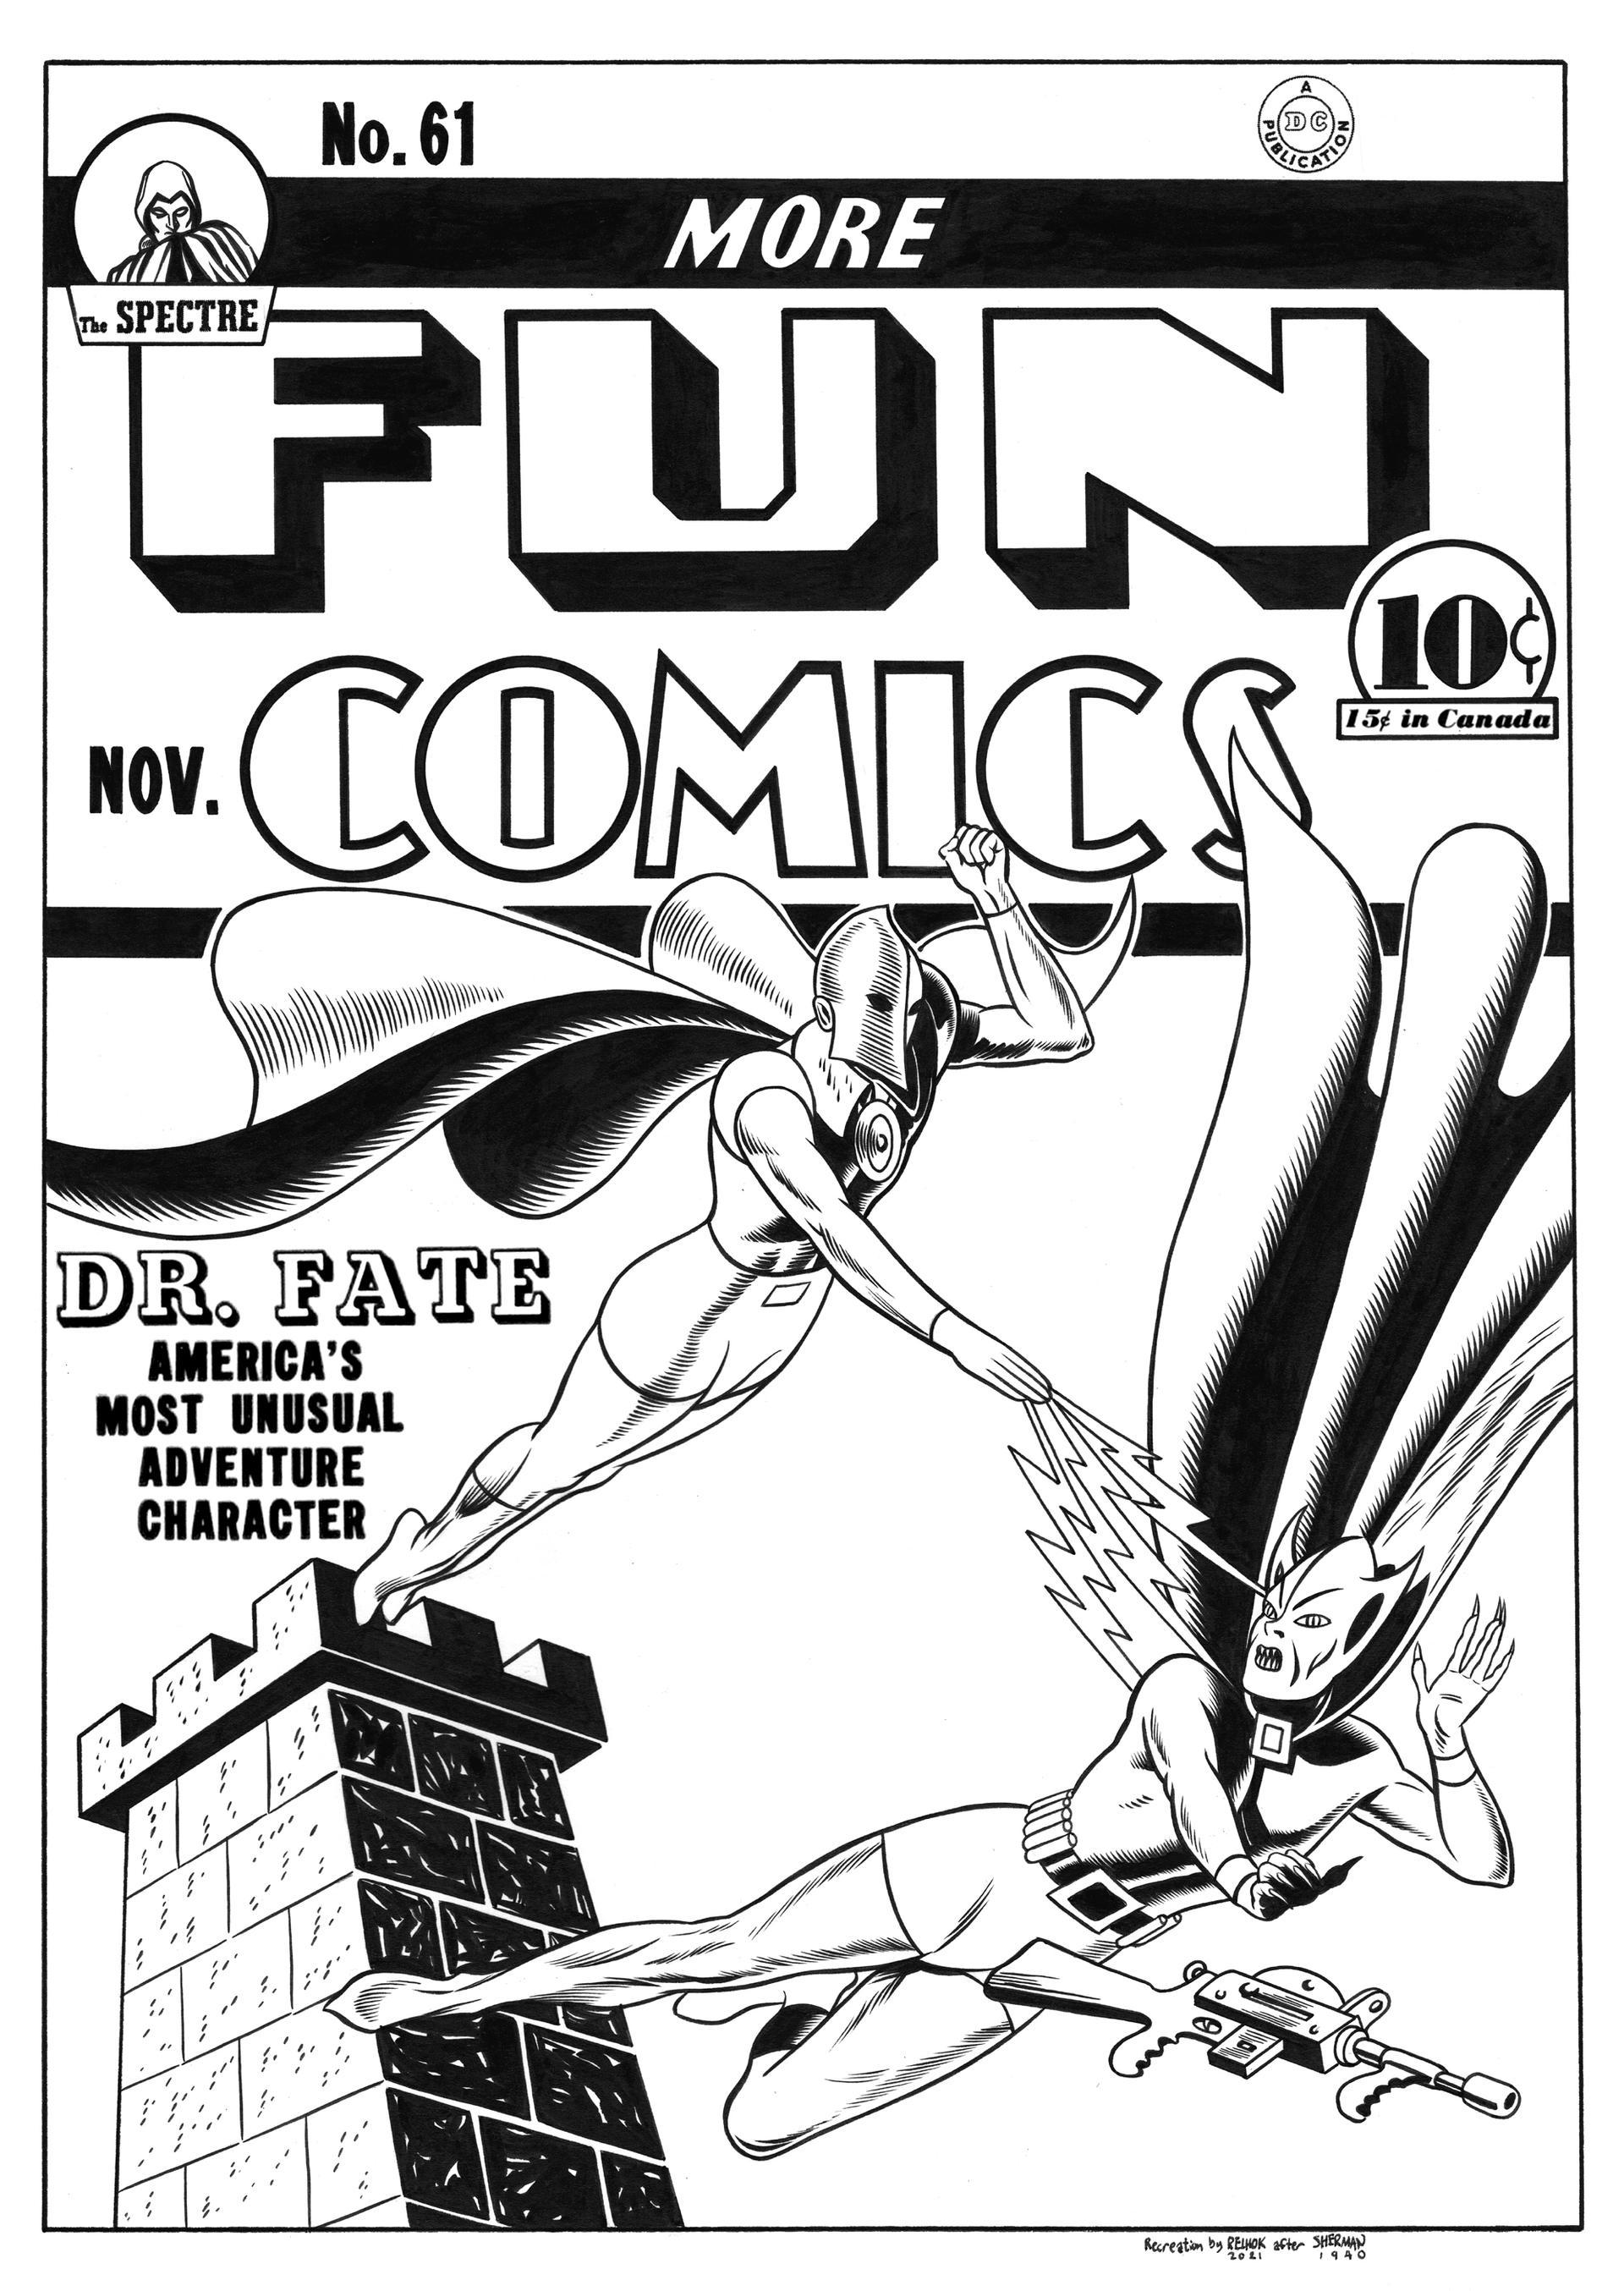 More Fun Comics #61 Cover Recreation